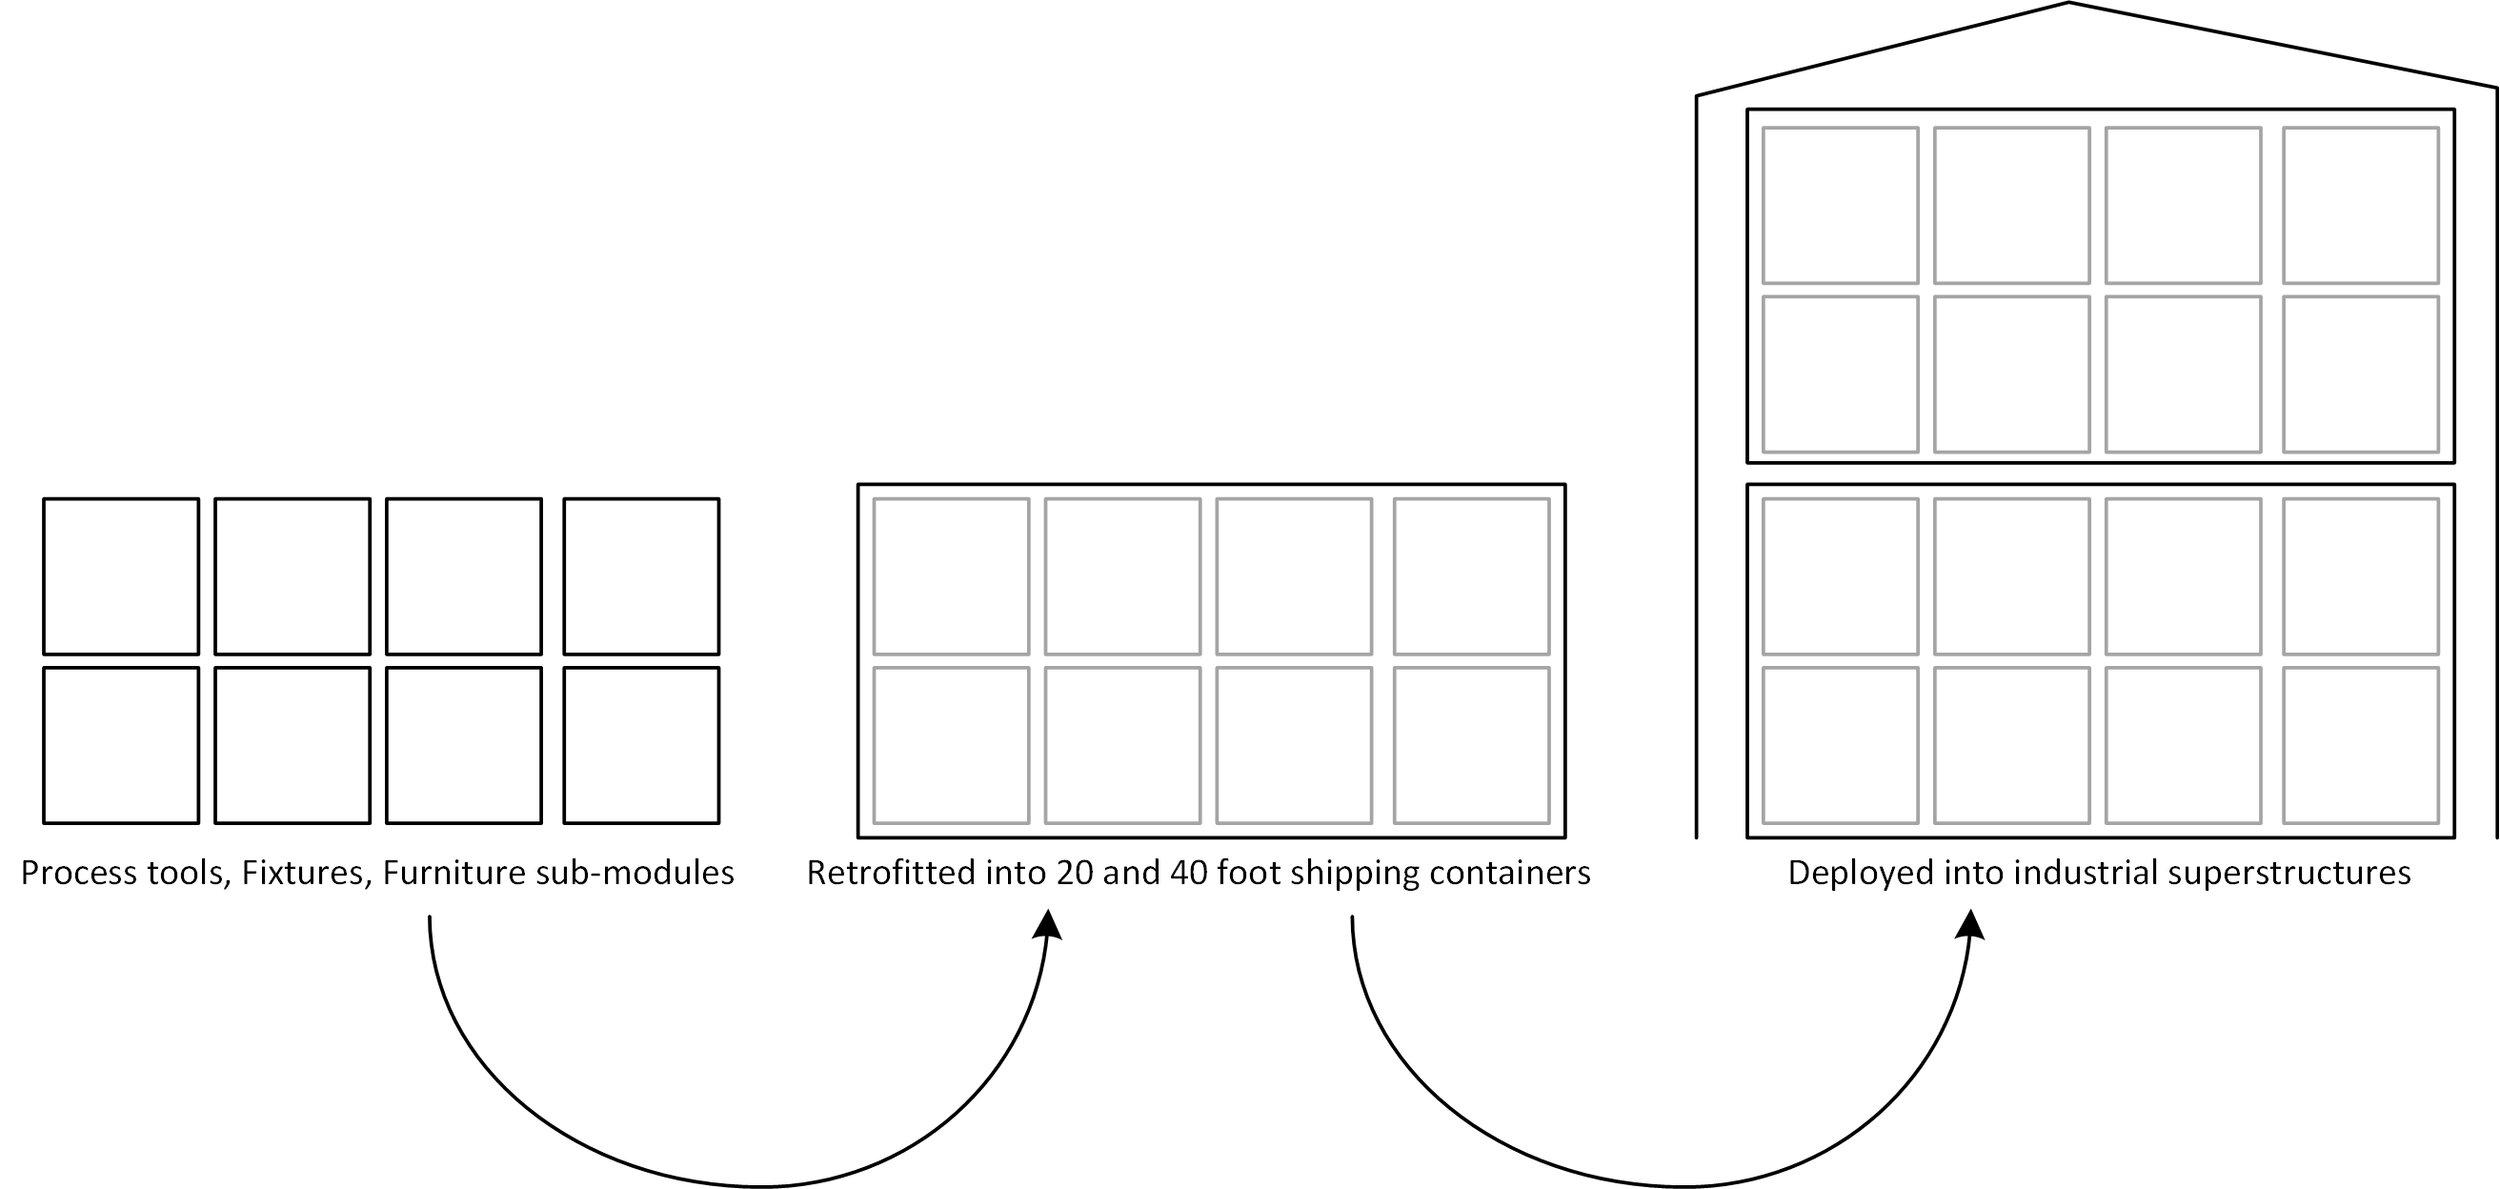 DOC19004-0_1A MODICA recursive Graphic.jpg